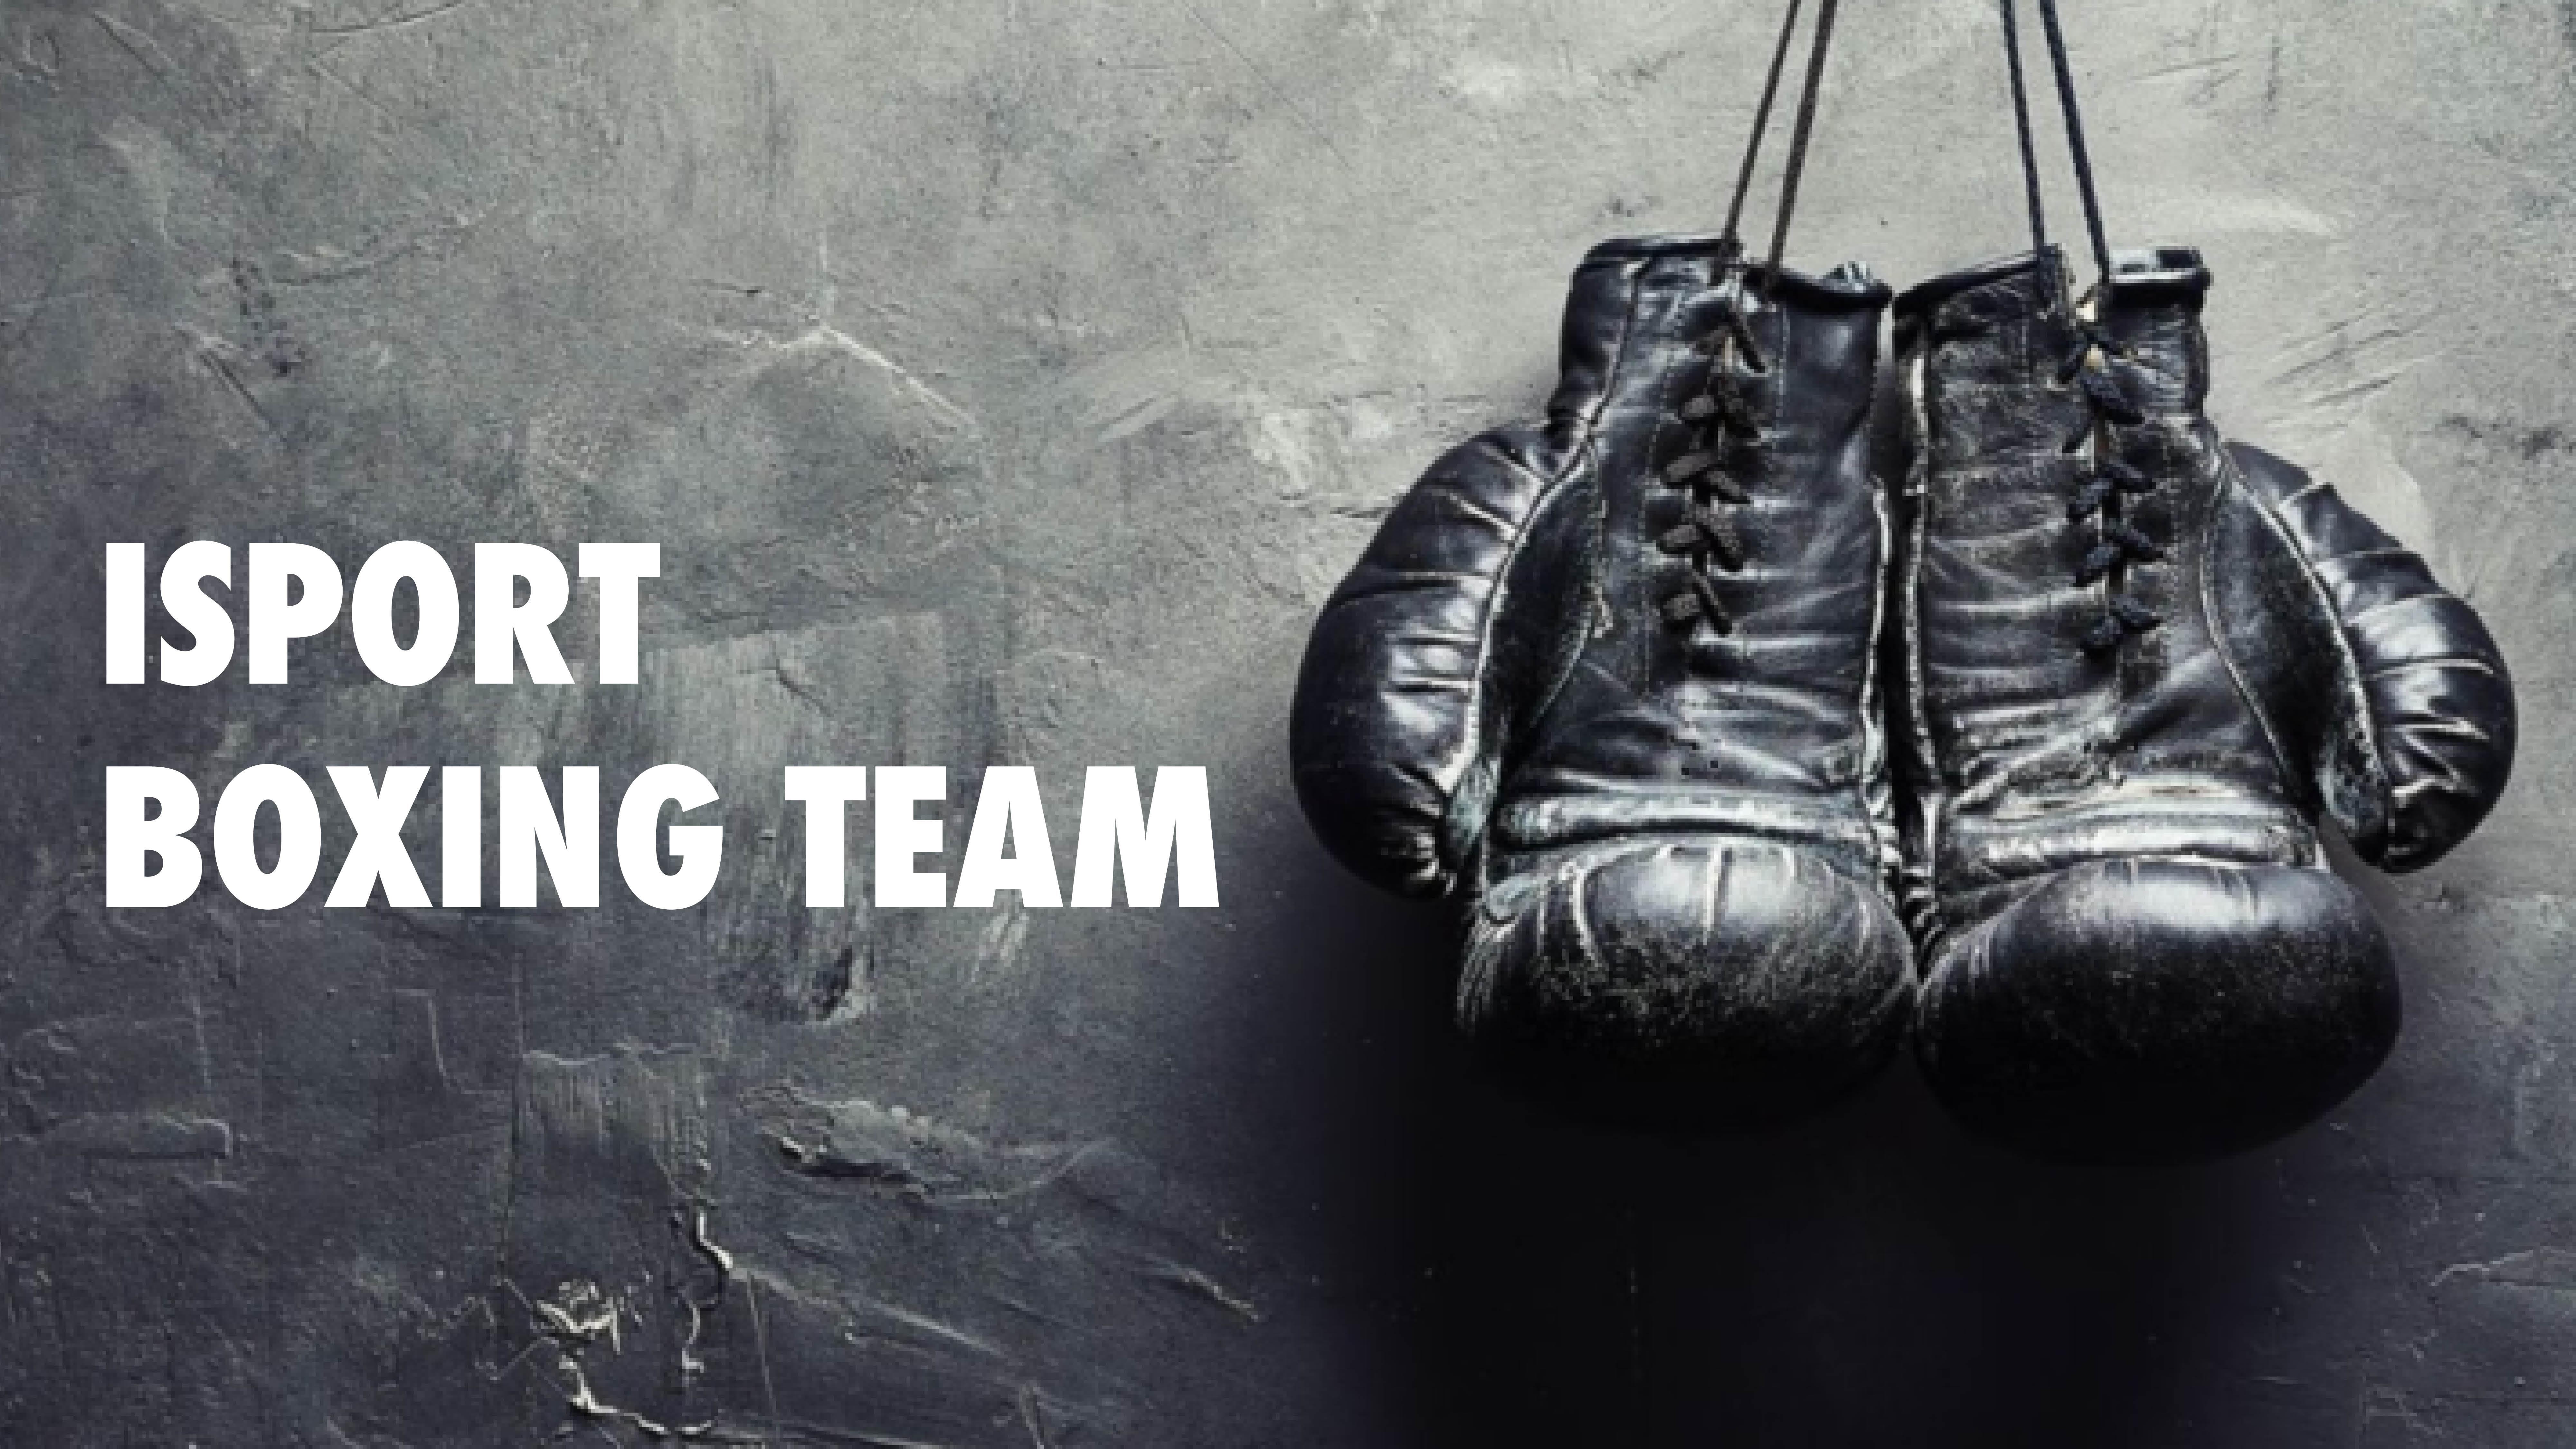 isport boxing team